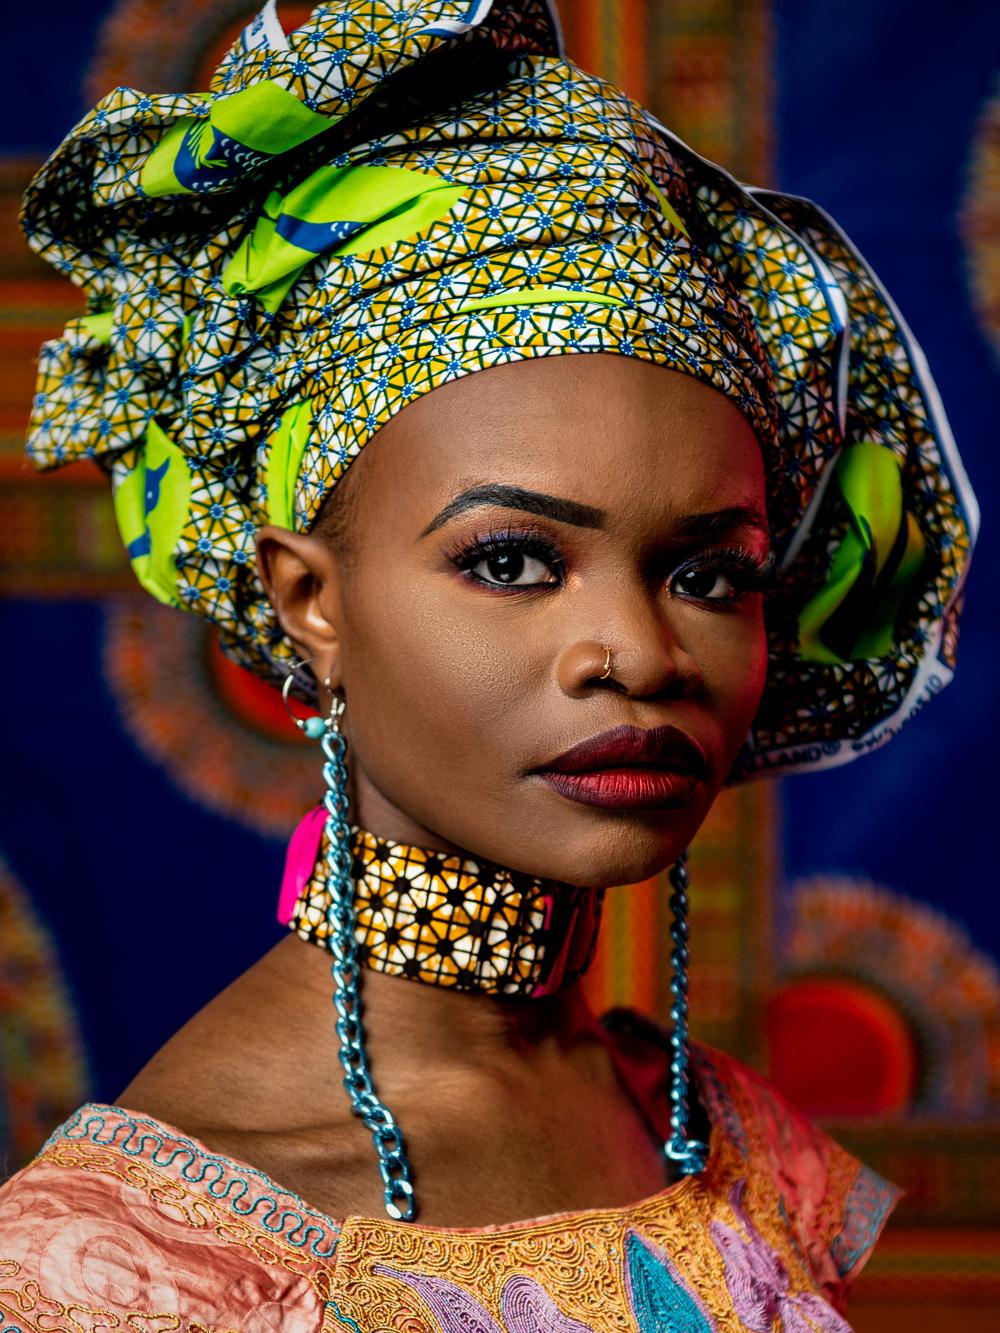 Malike Sidibe